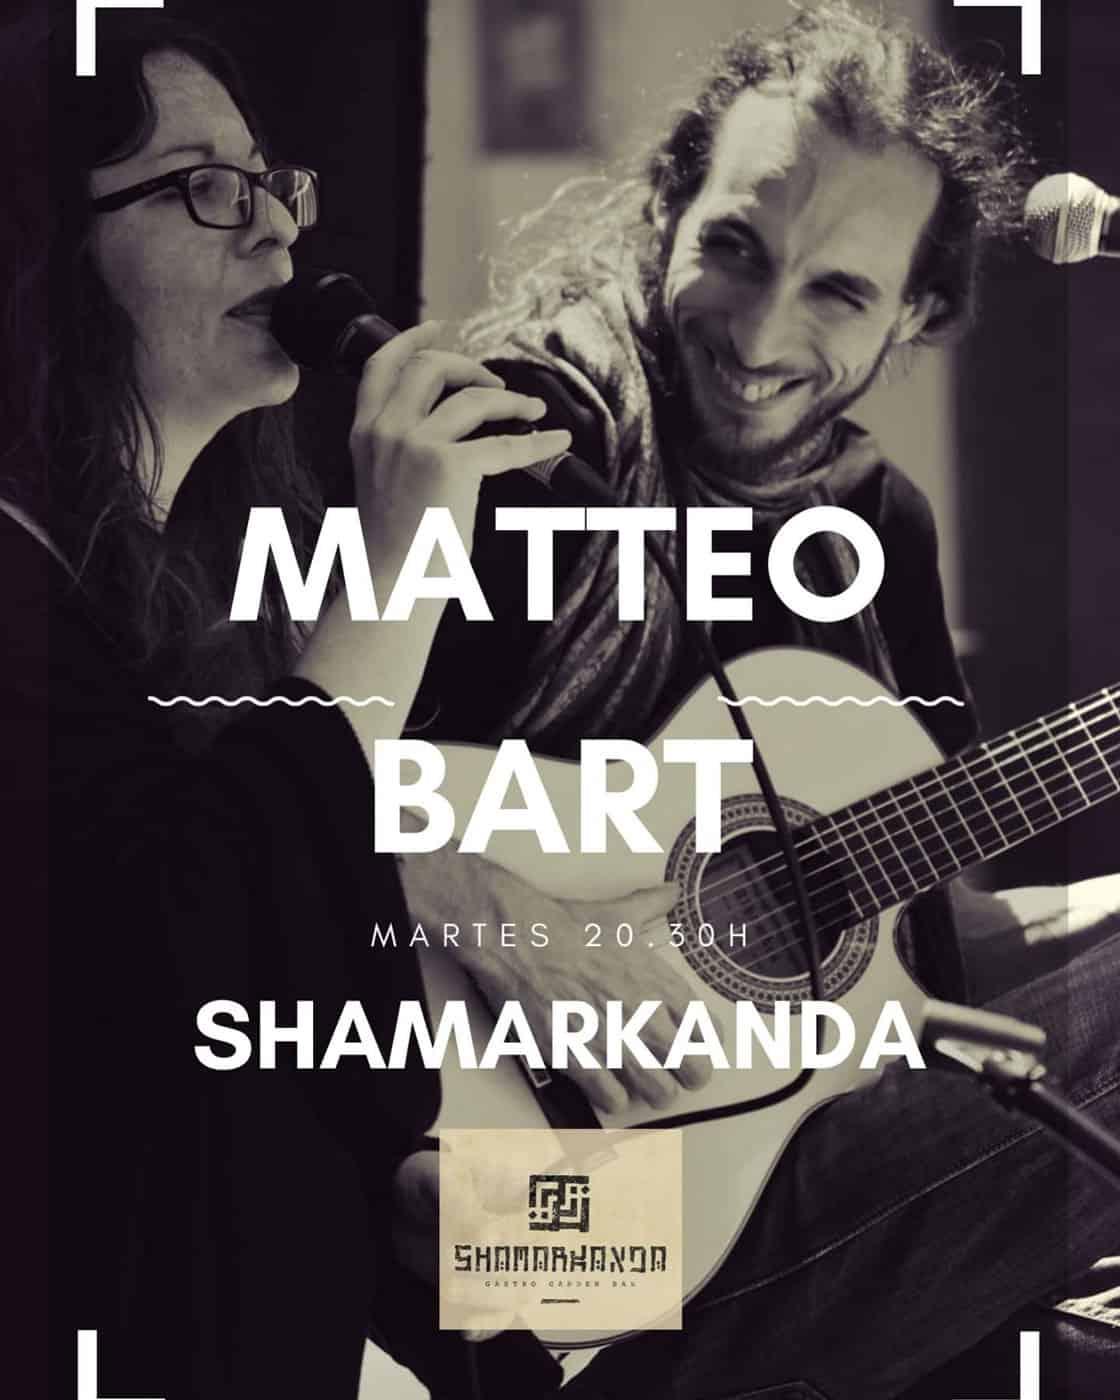 matteo-and-bart-shamarkanda-ibiza-2021-welcometoibiza